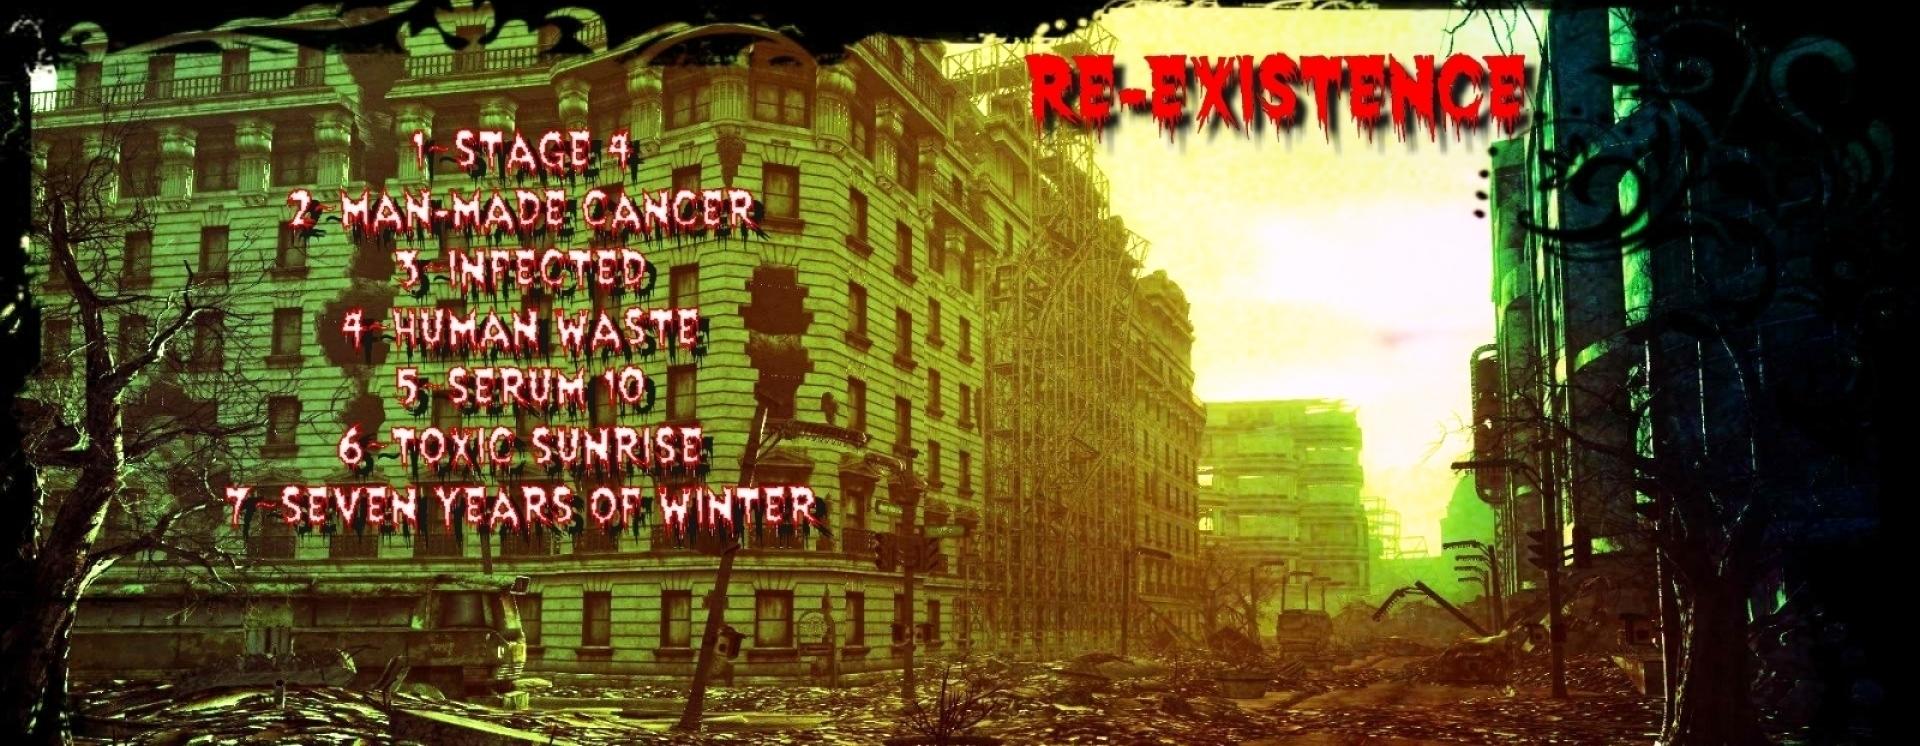 Dead city 6 copy